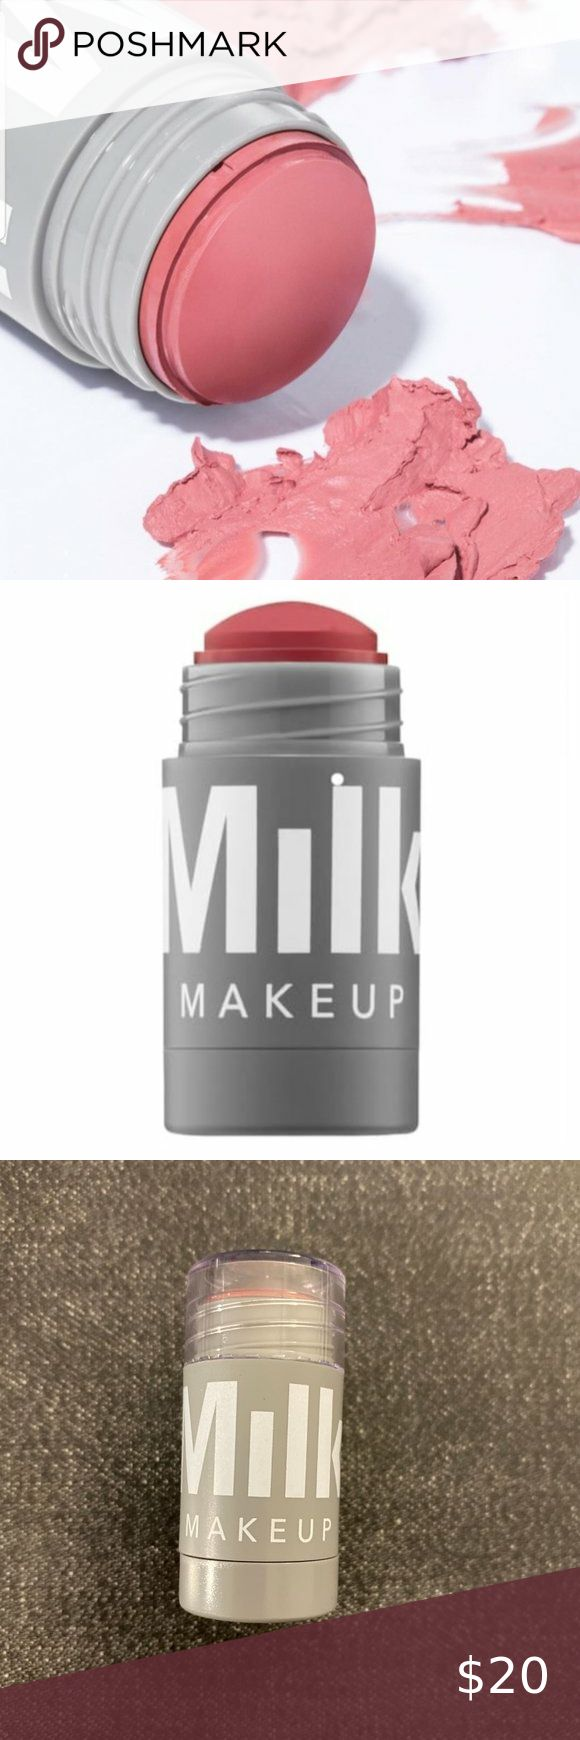 NWT] MILK Makeup Lip + Cheek in Werk New, never opened